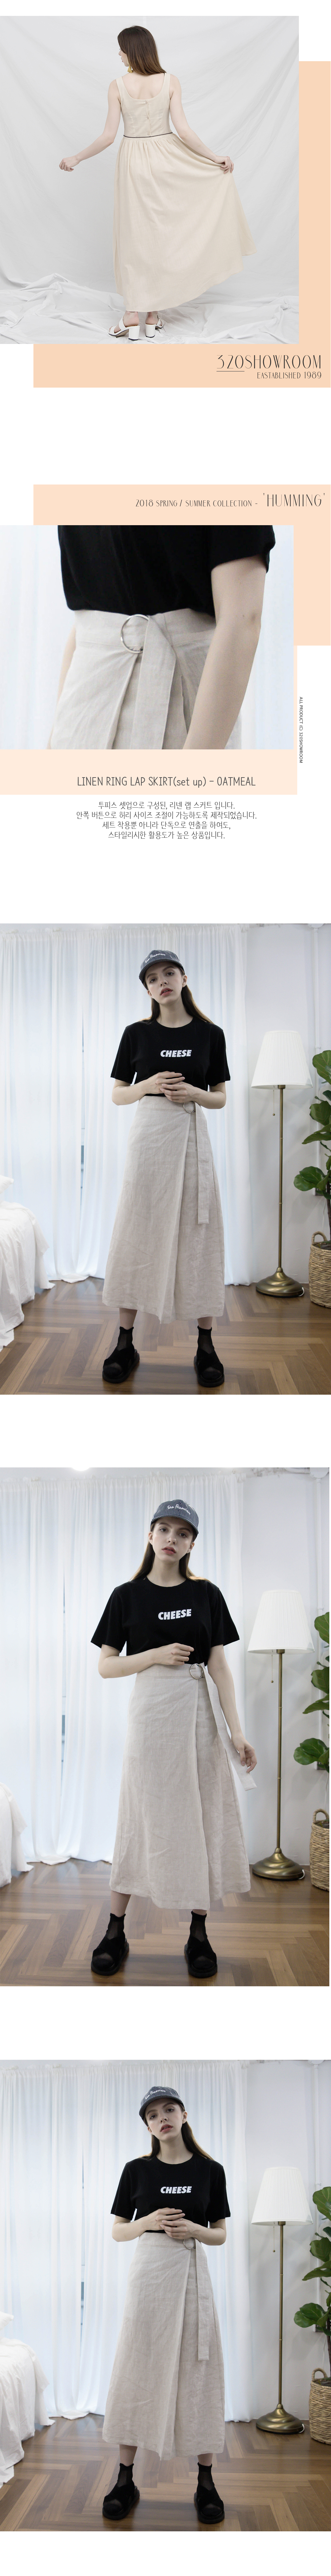 linen-set-SK_OA_DETAIL1_01.jpg